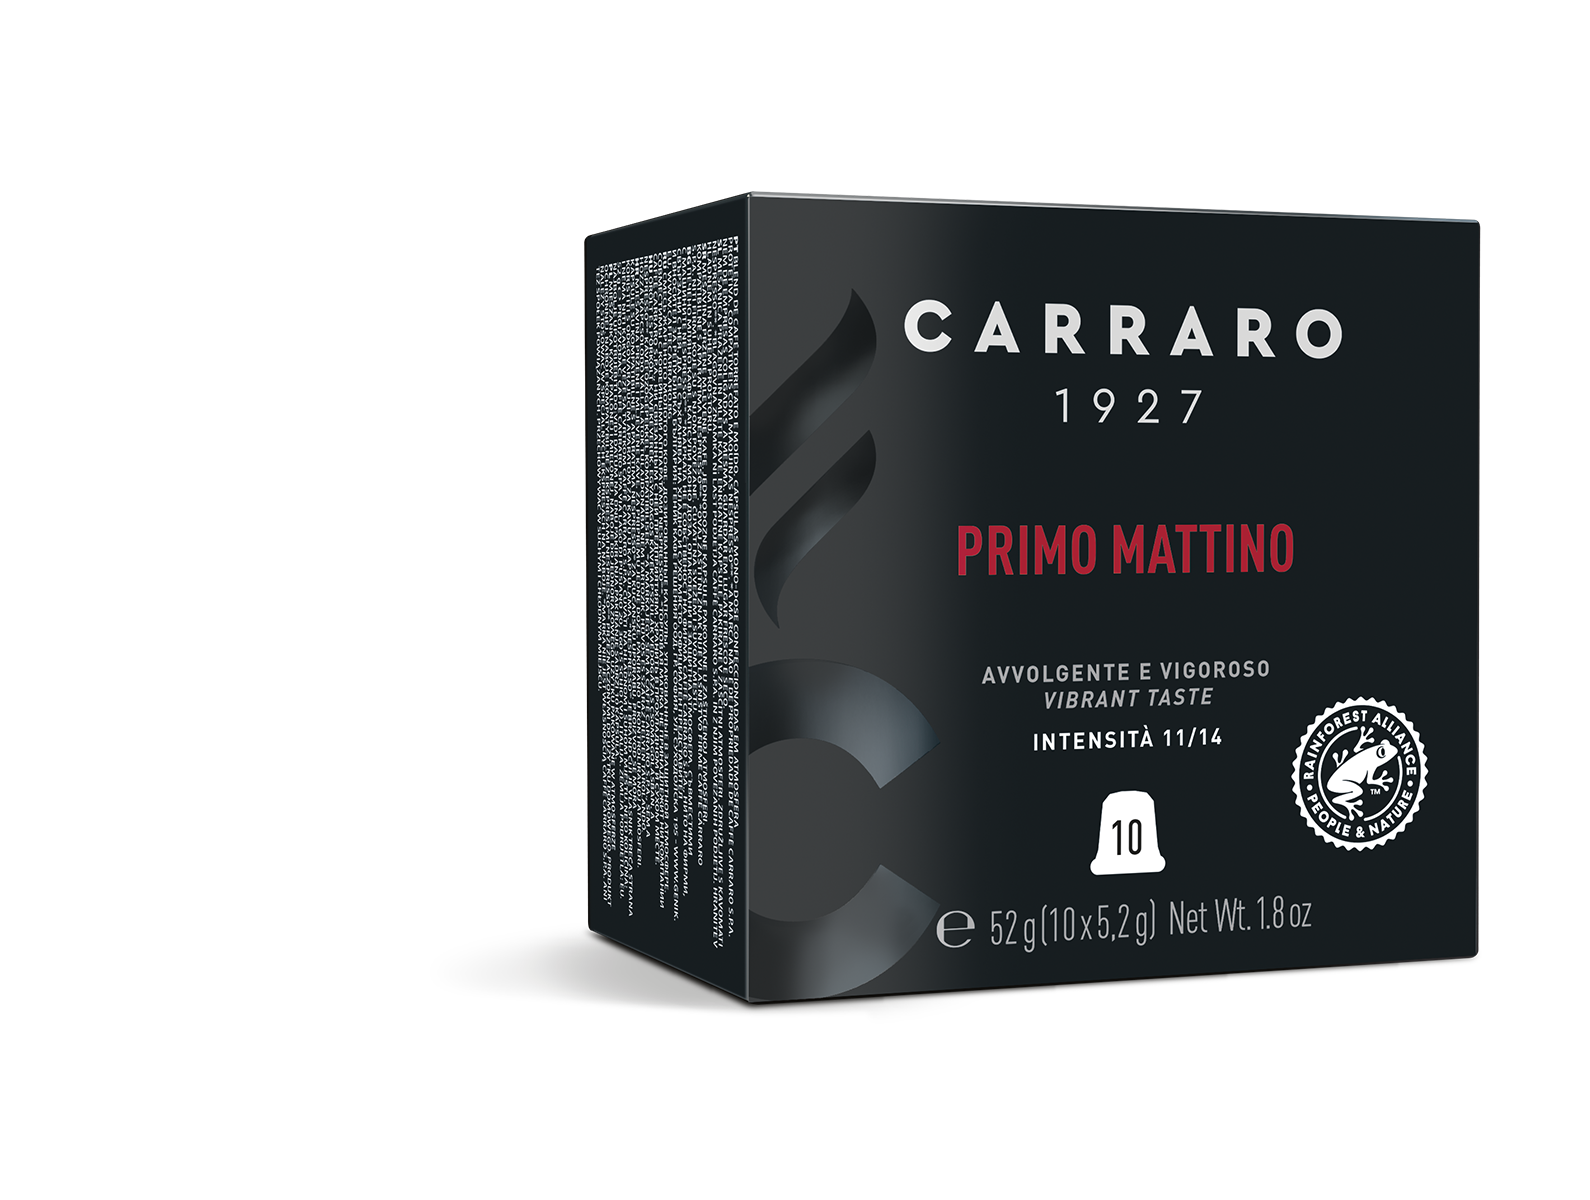 Primo Mattino – 10 capsule premium in astuccio cubo